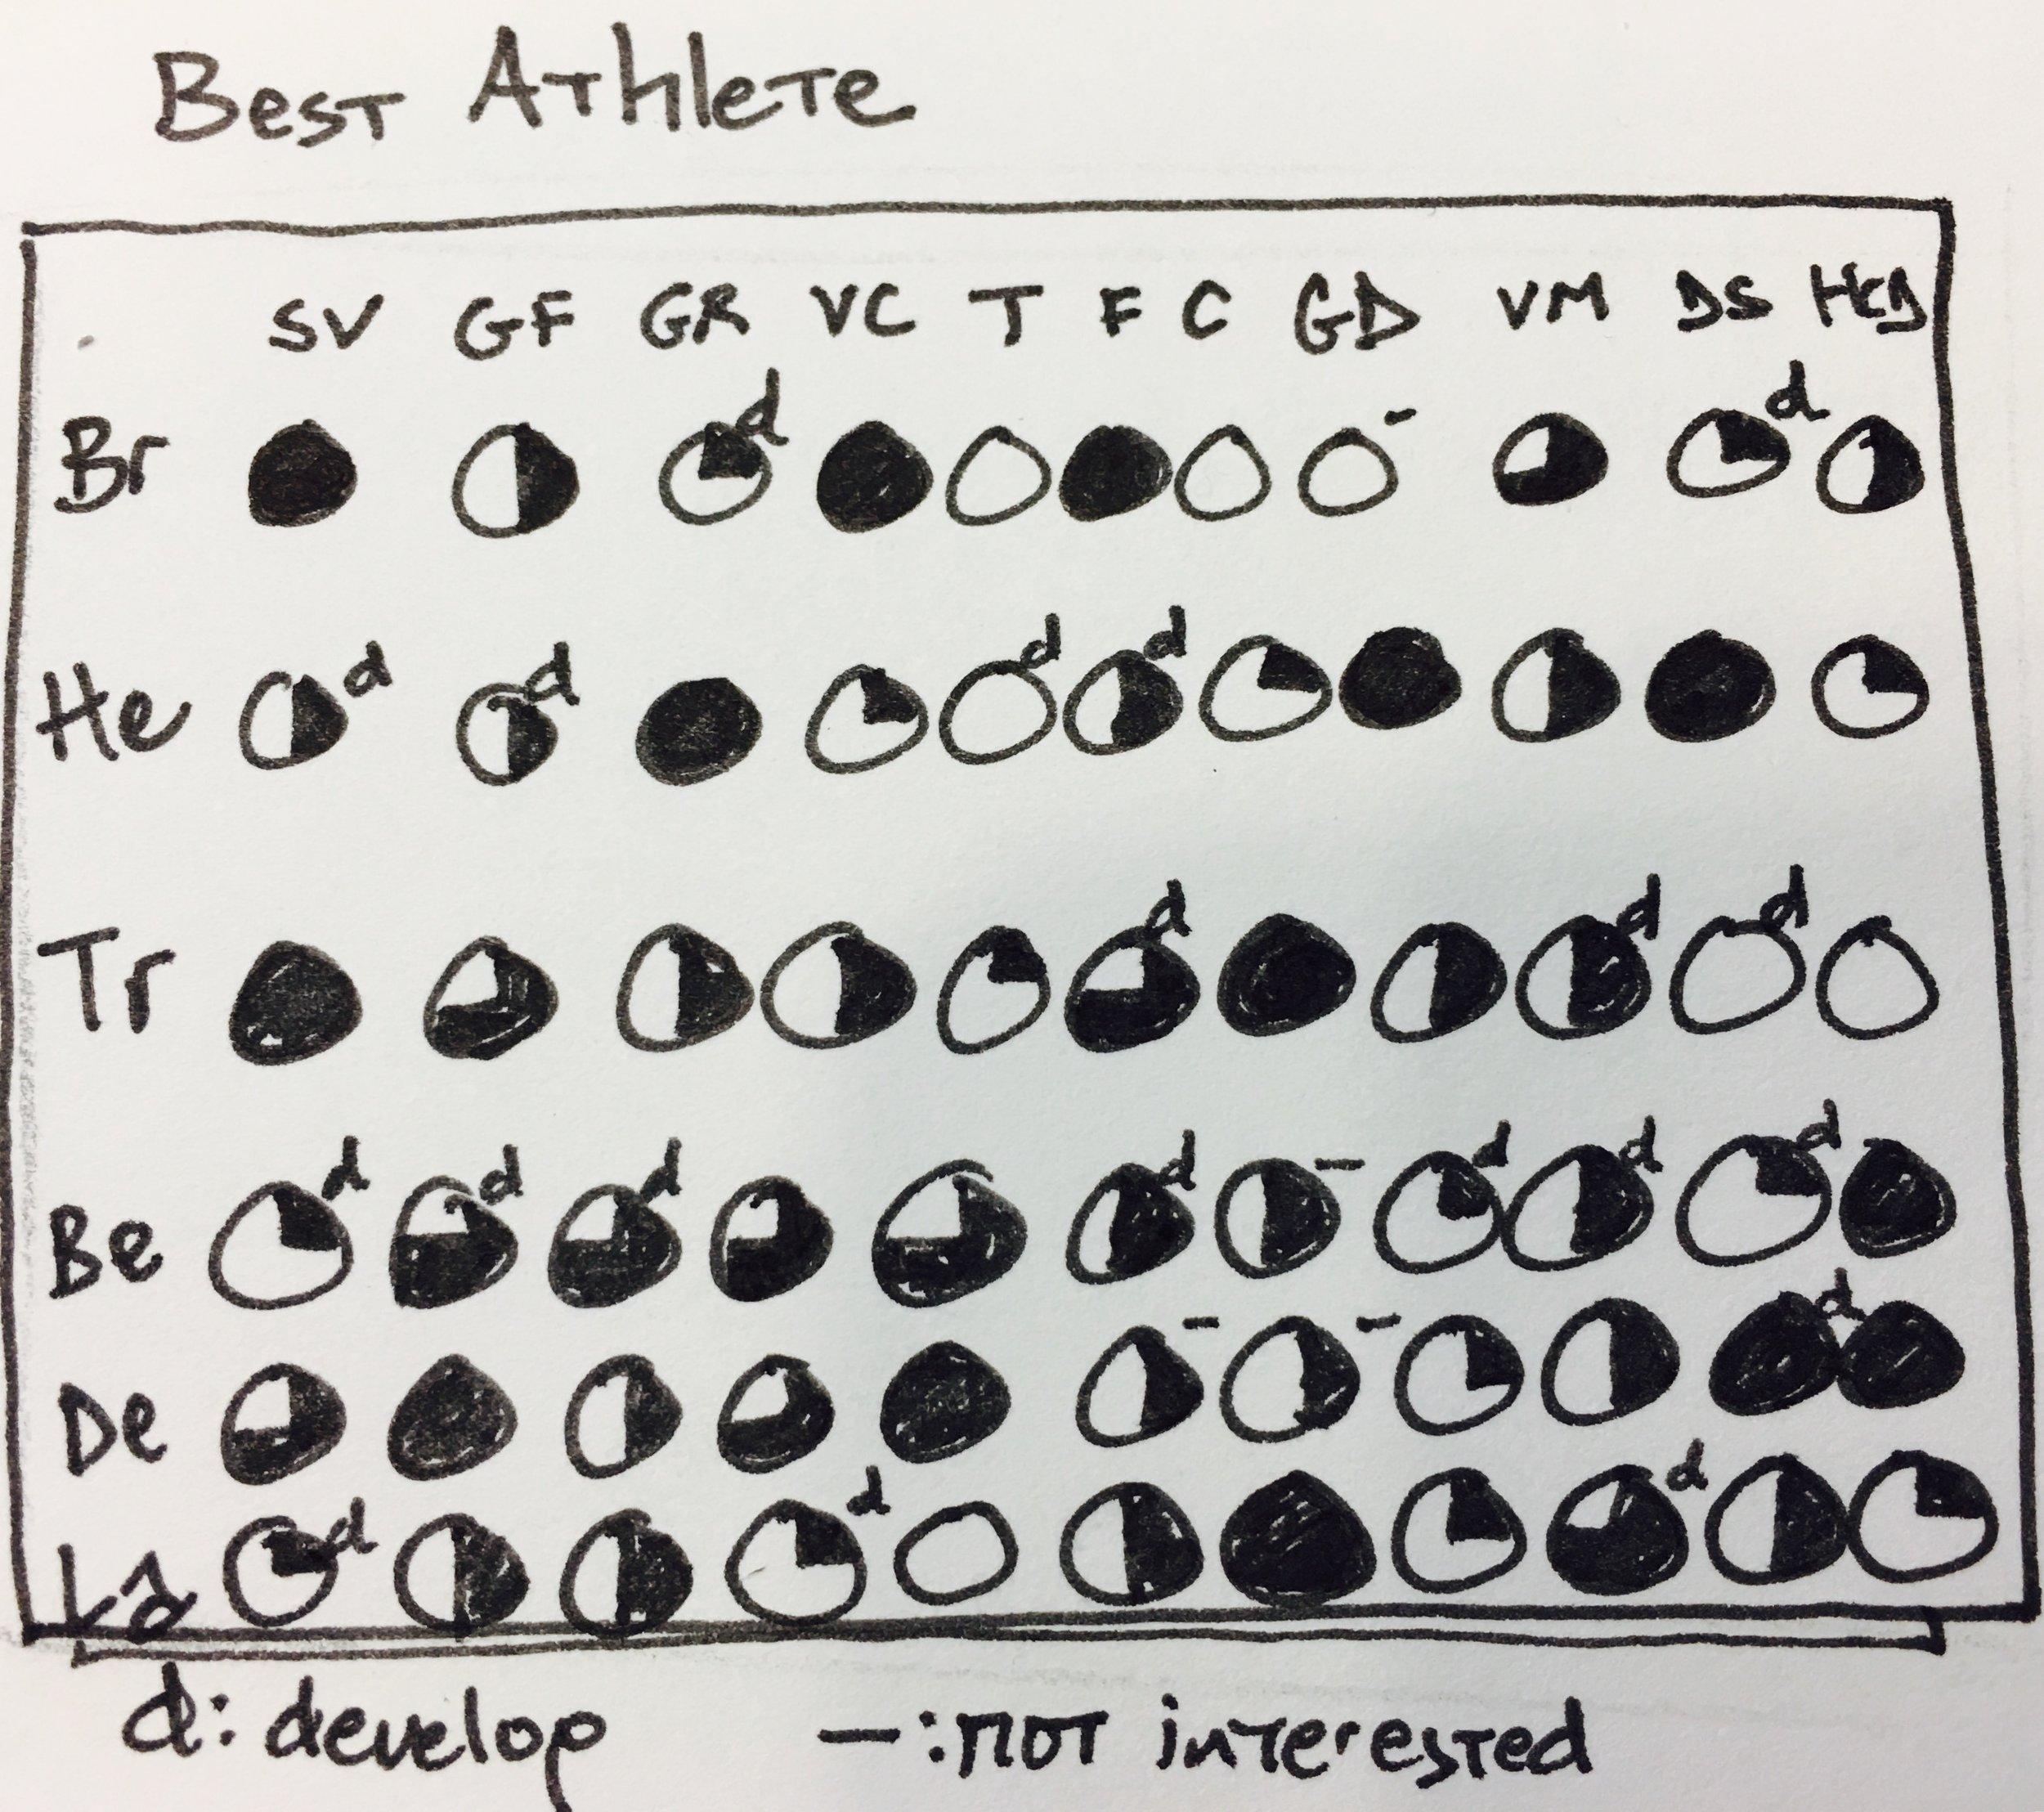 Best Athlete chart